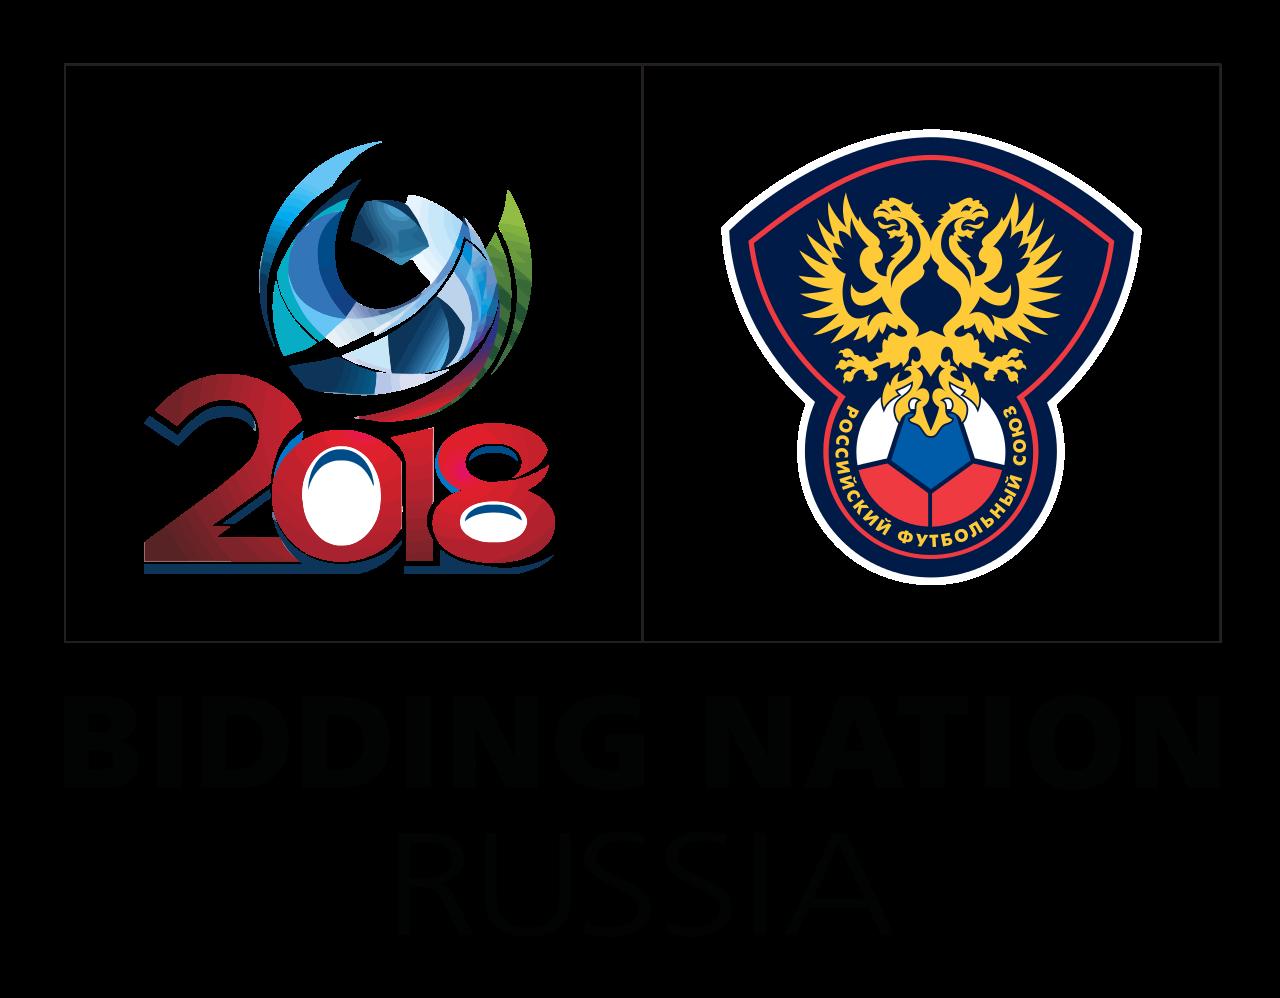 File:Russia 2018 FIFA World Cup Bid Logo.svg - Logo Fifa World Cup 2018 PNG